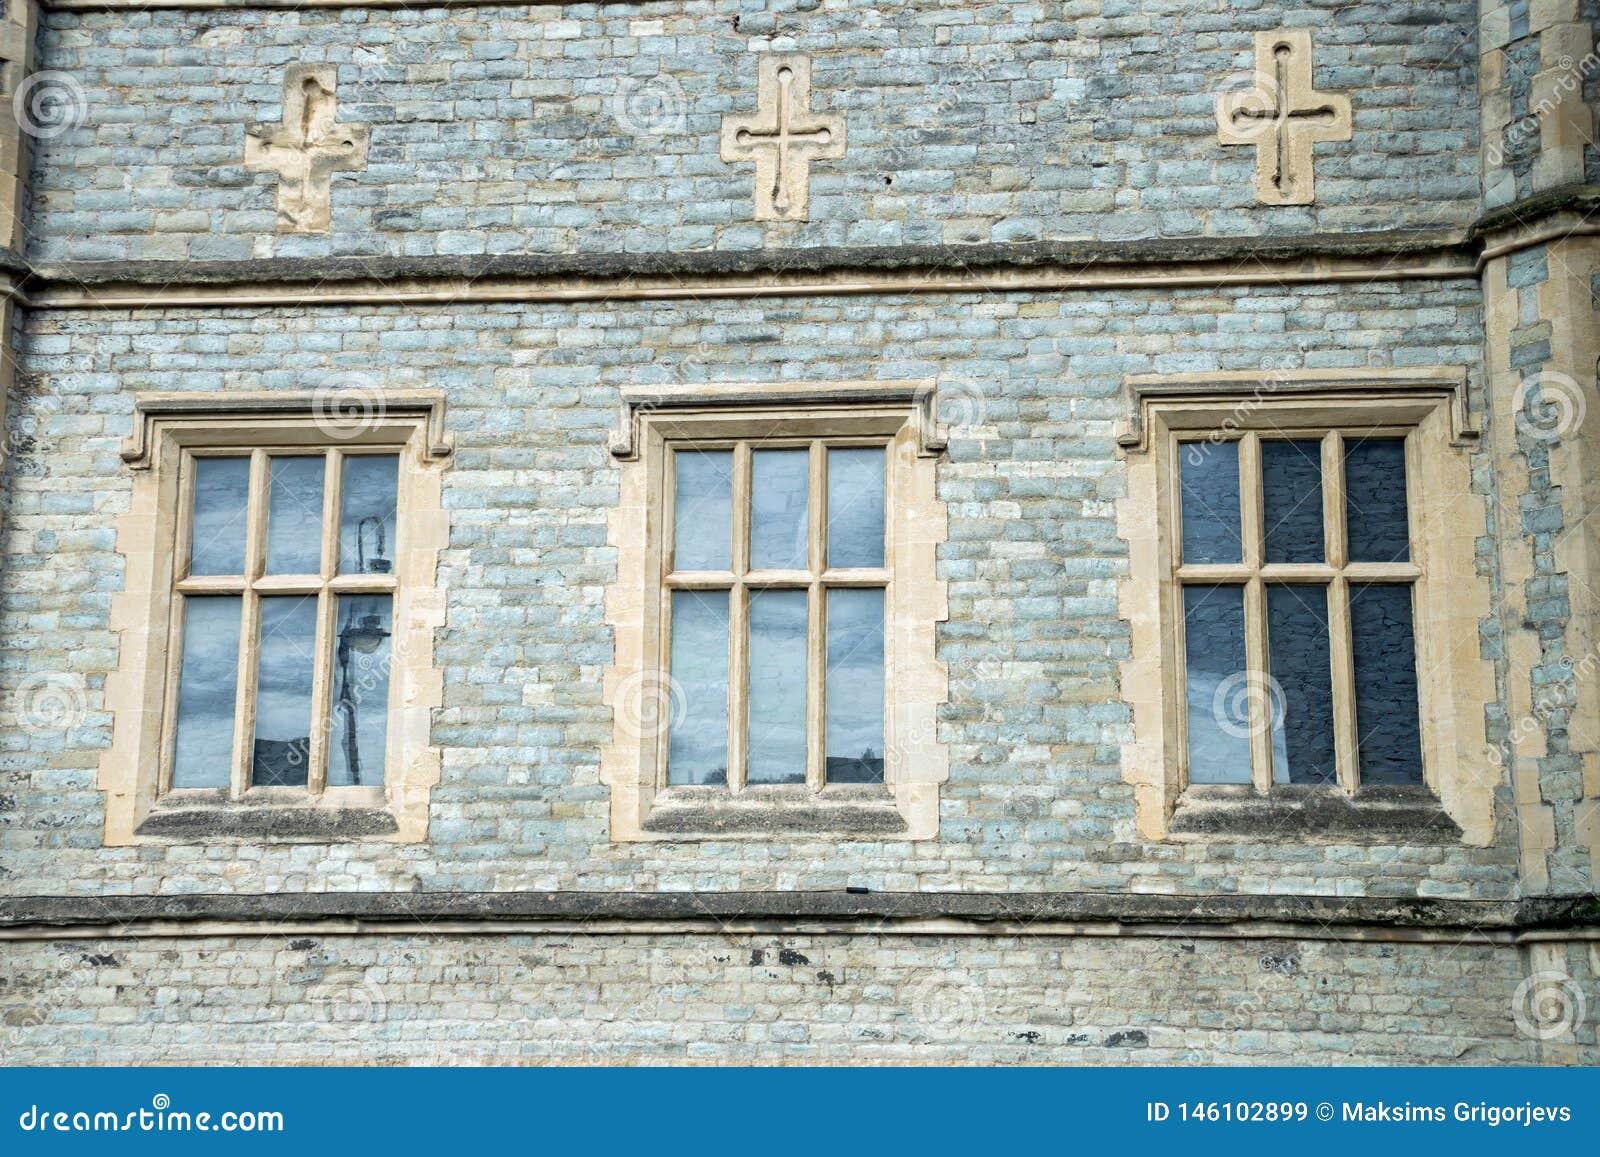 Arquitetura inglesa tradicional velha, três janelas e cruzes acima